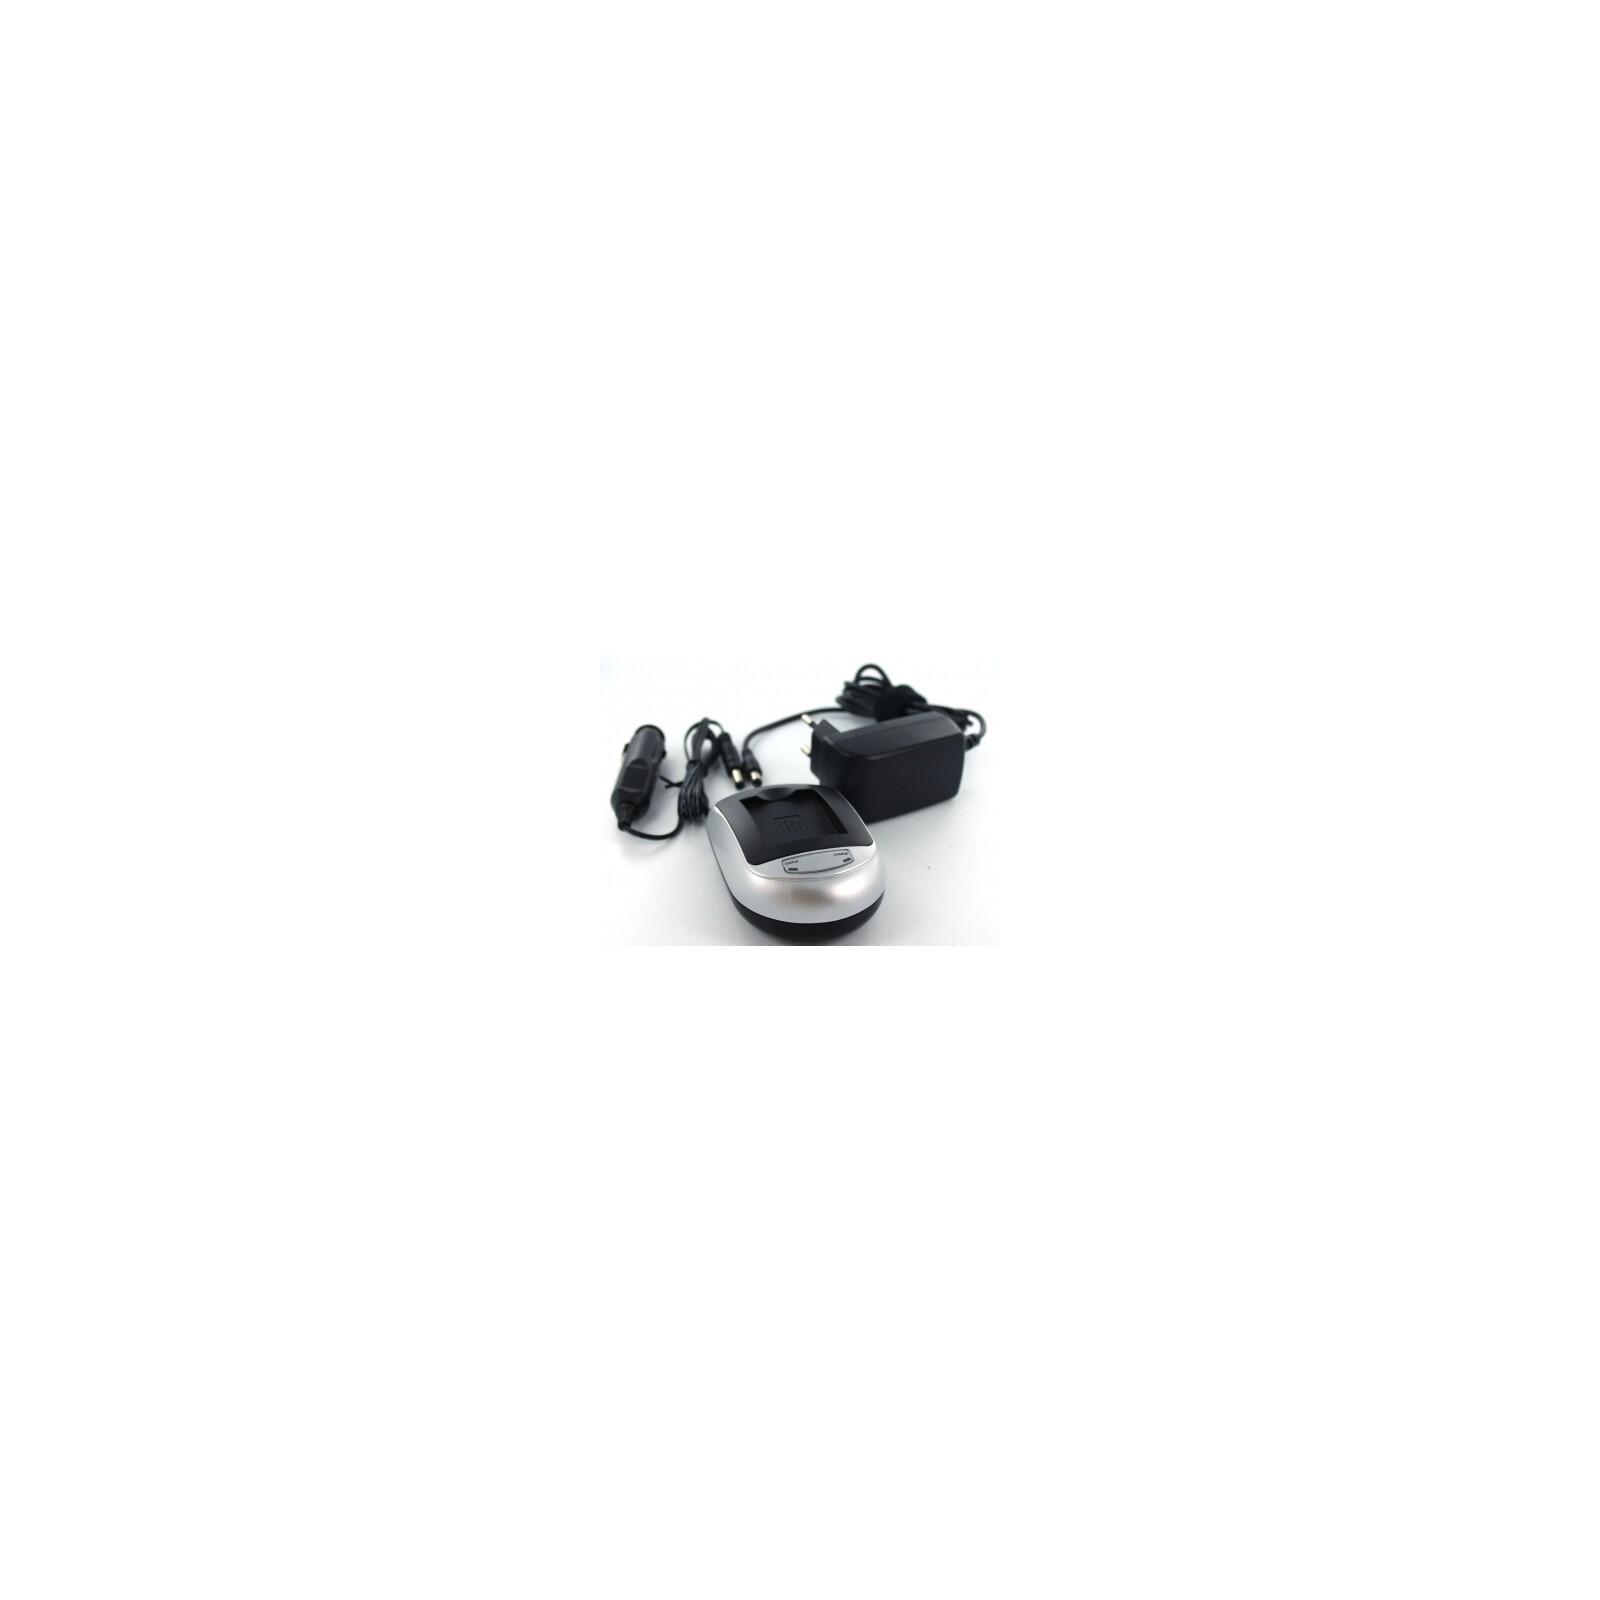 AGI 92156 Ladegerät Nikon Coolpix P2